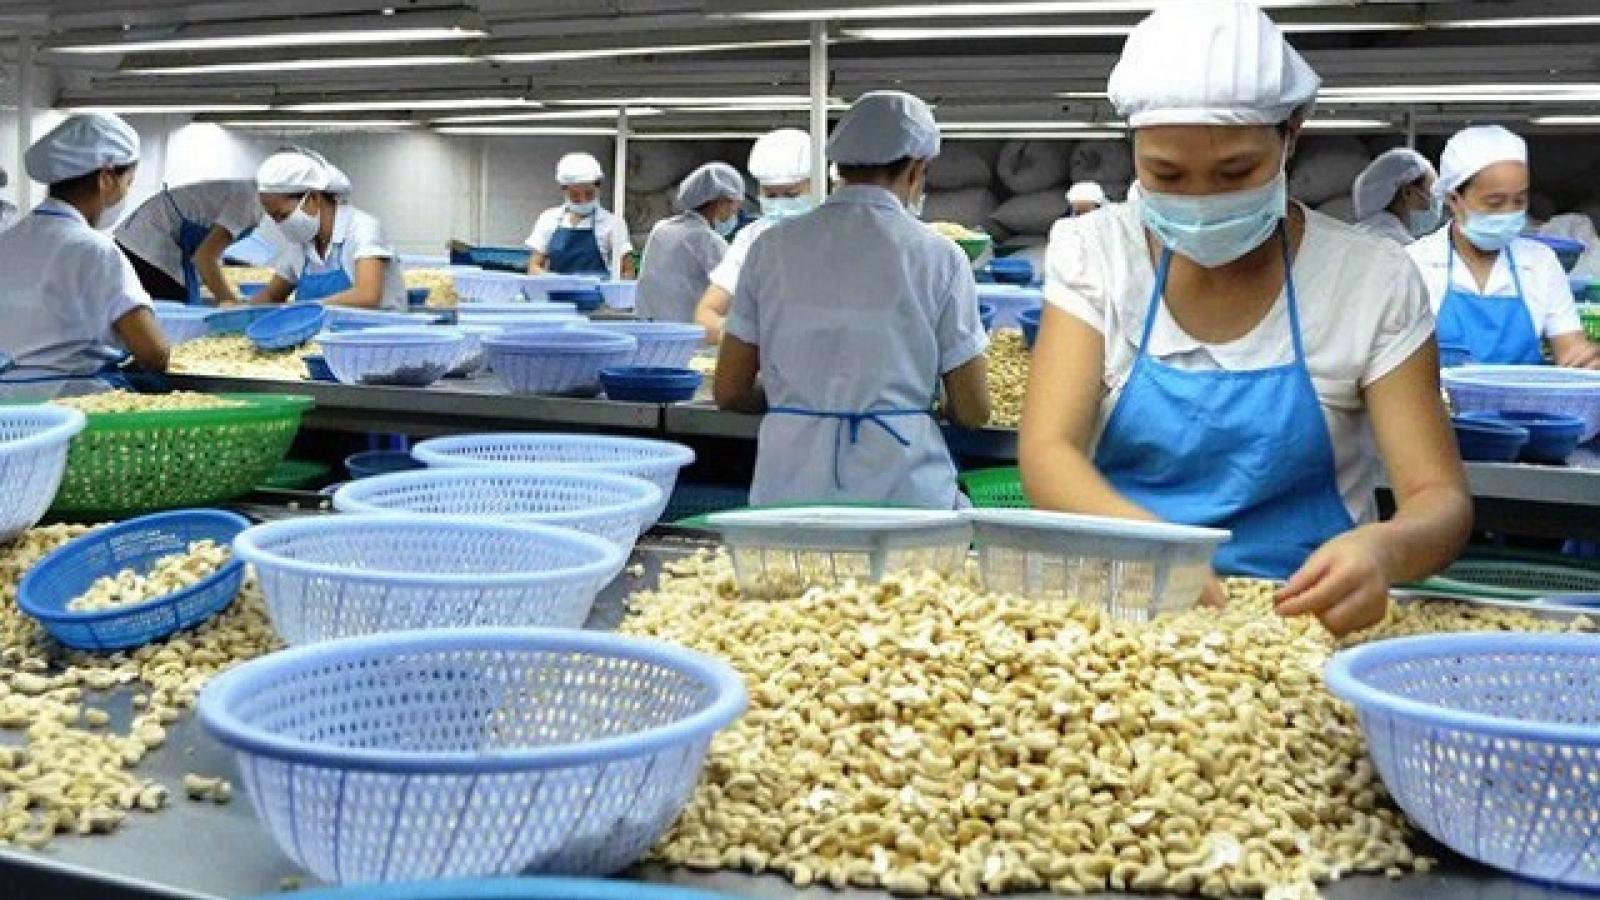 Agriculture enjoys trade surplus despite COVID-19 impact